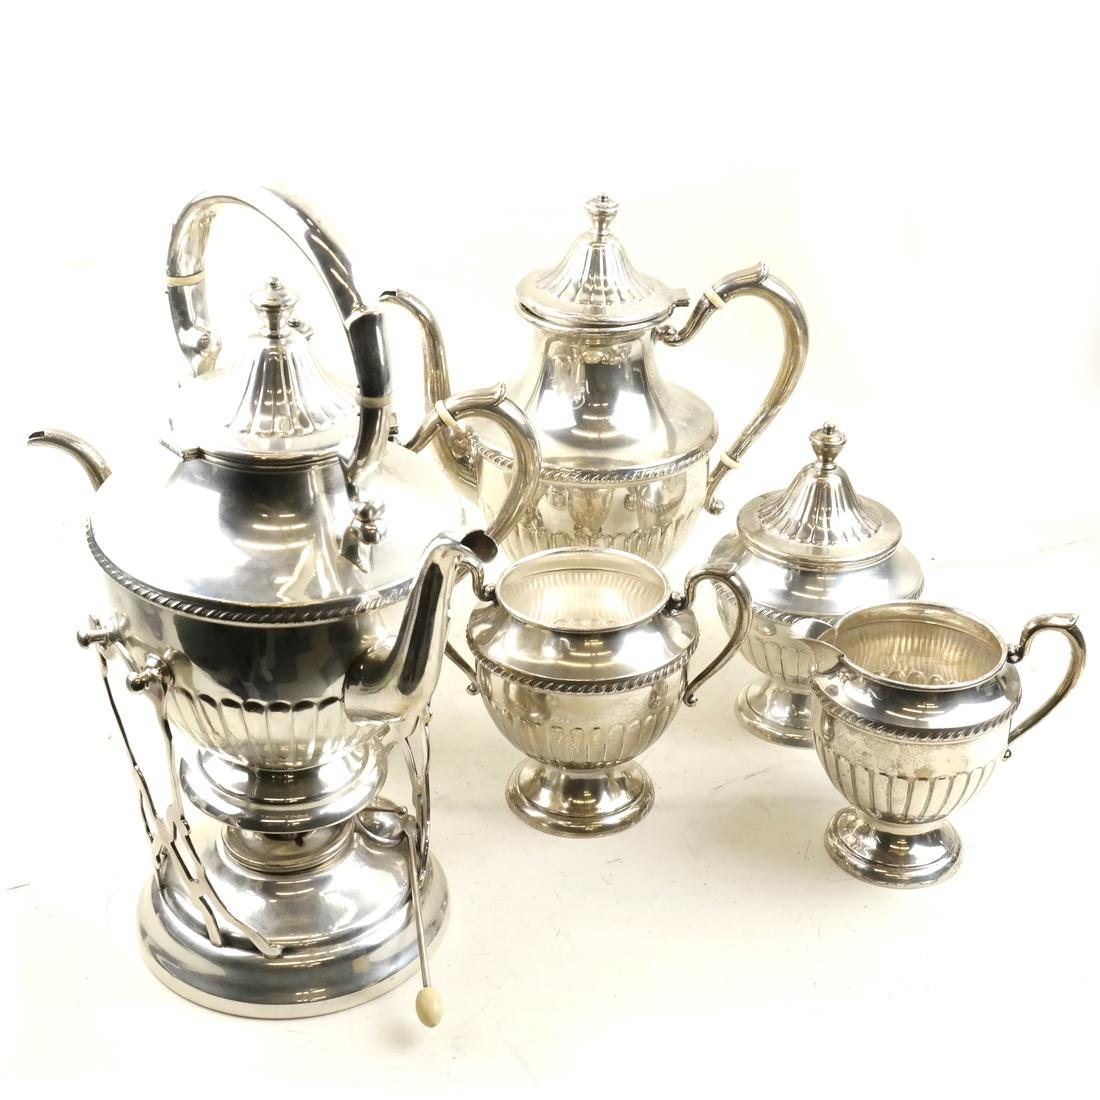 Six Piece Sterling Silver Tea Service